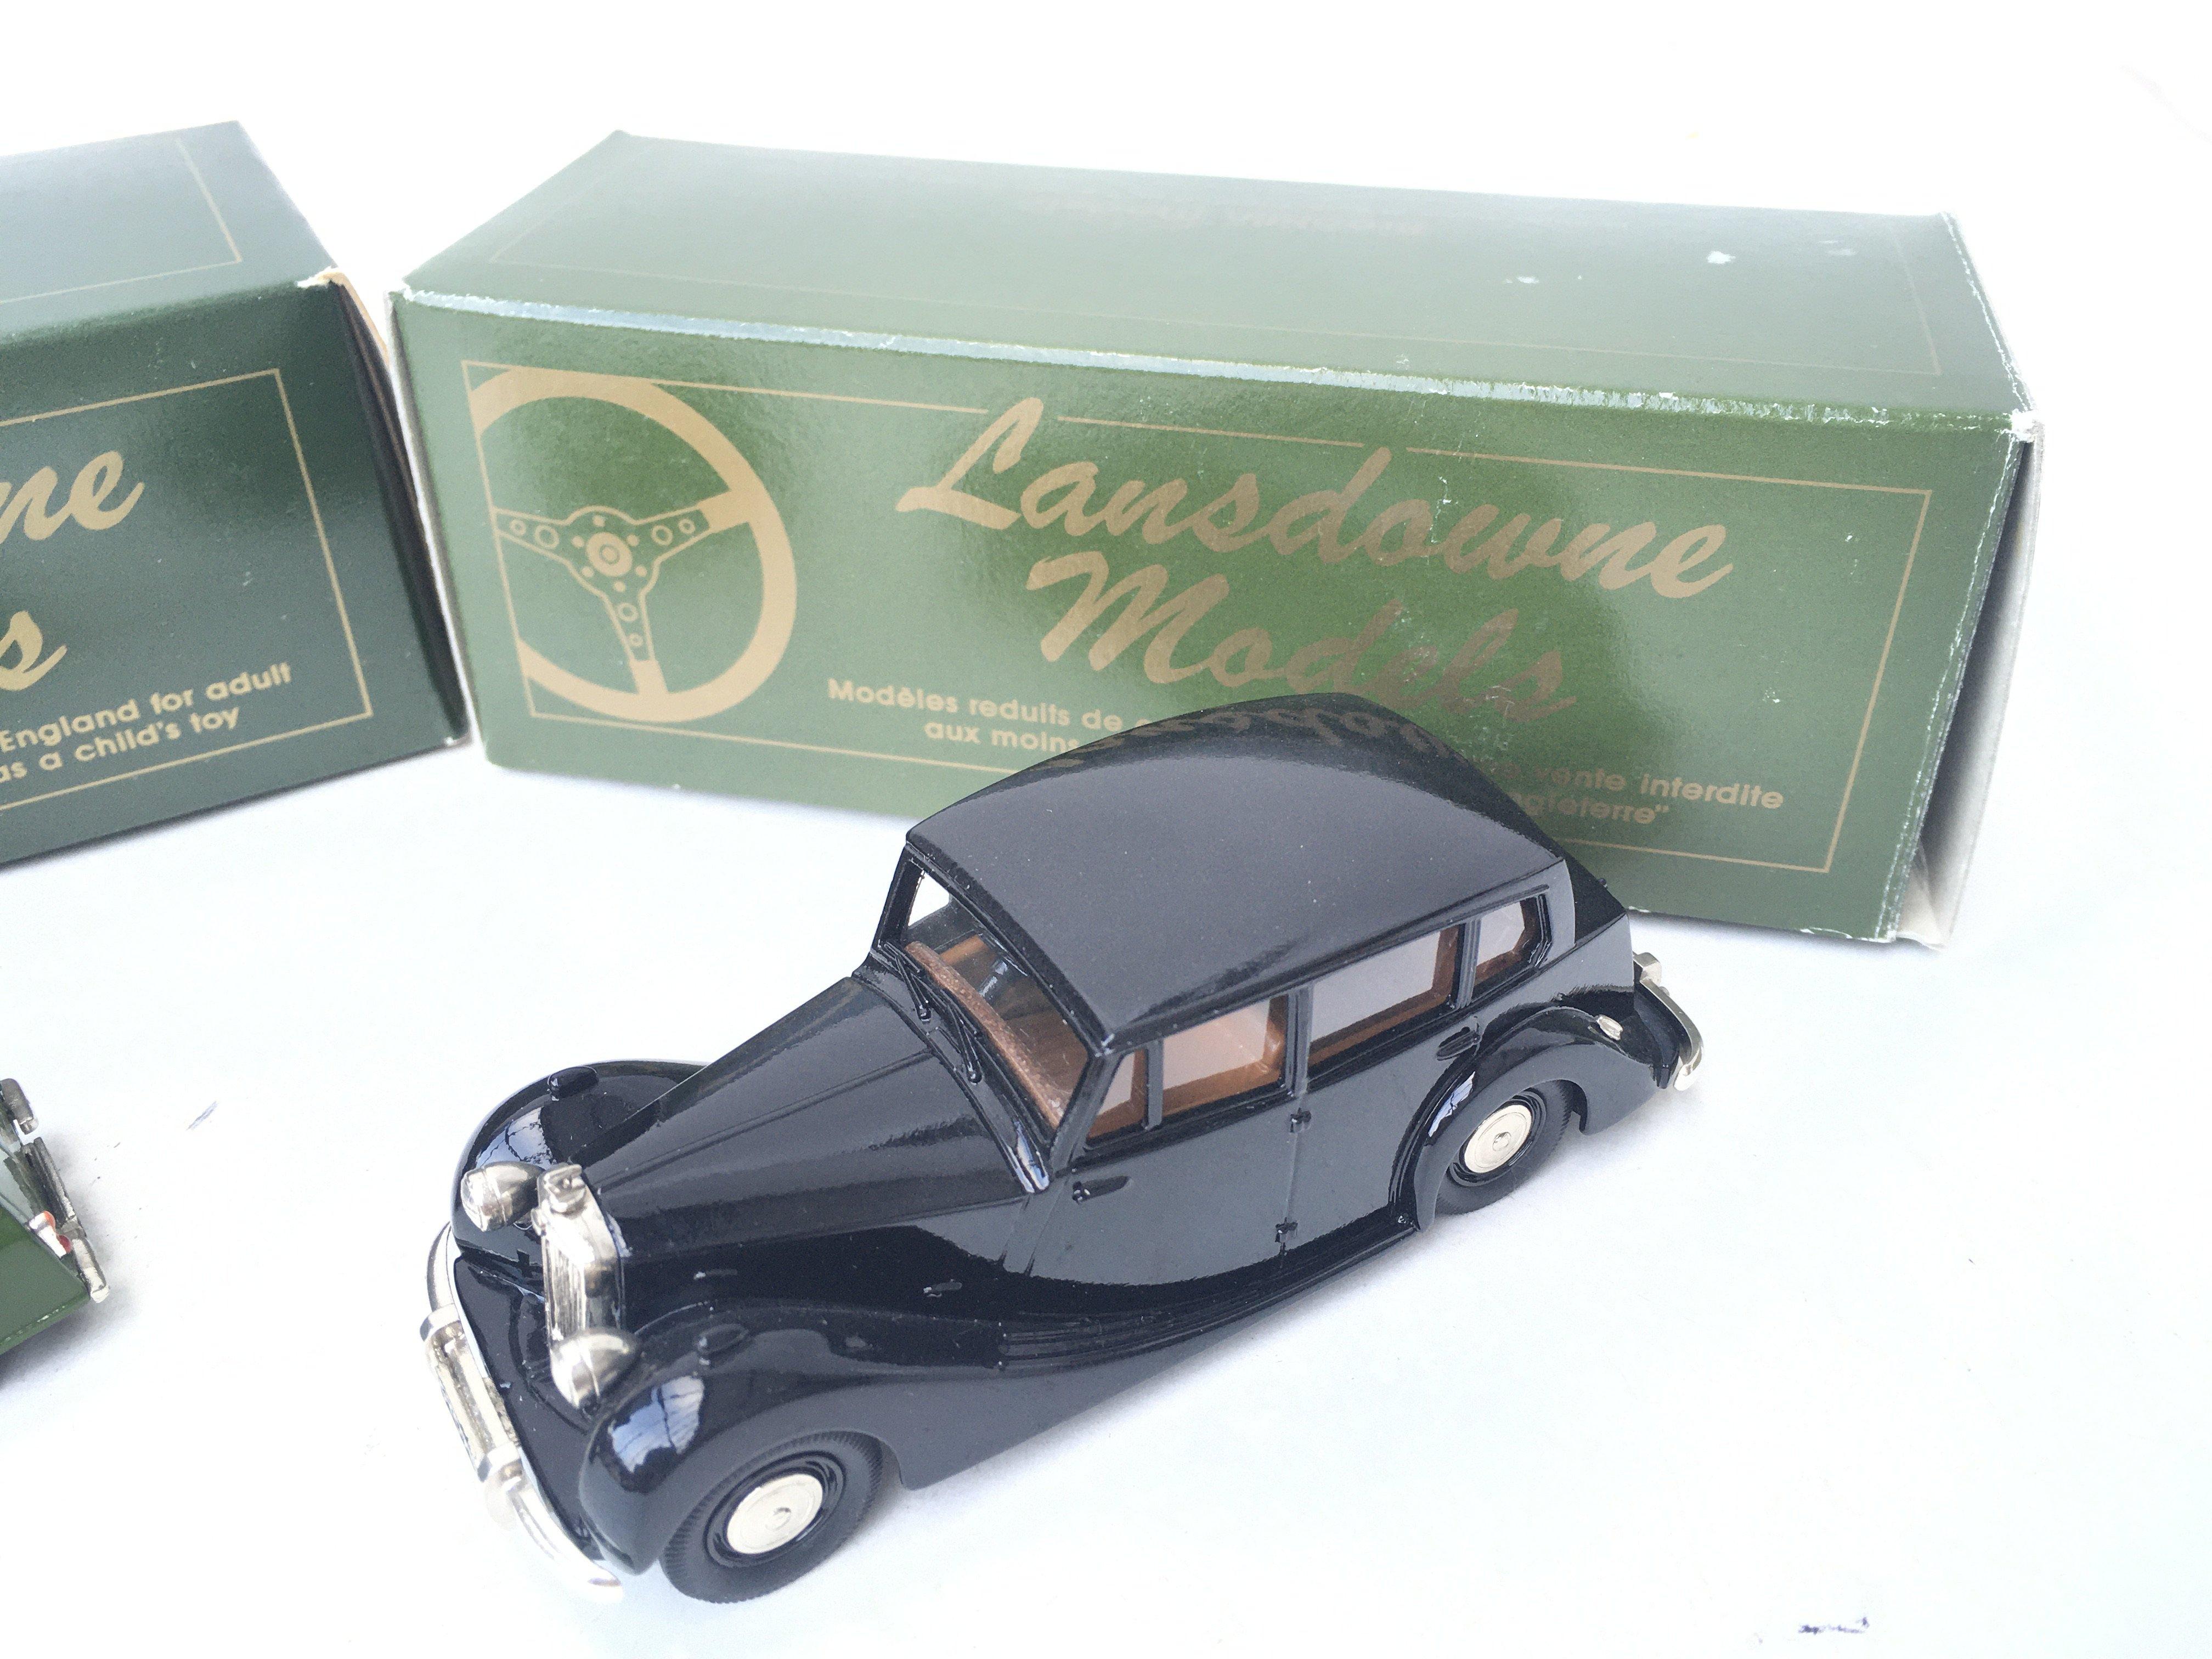 2 X Lansdowne Models including LD4 1962 Morris Min - Image 3 of 3